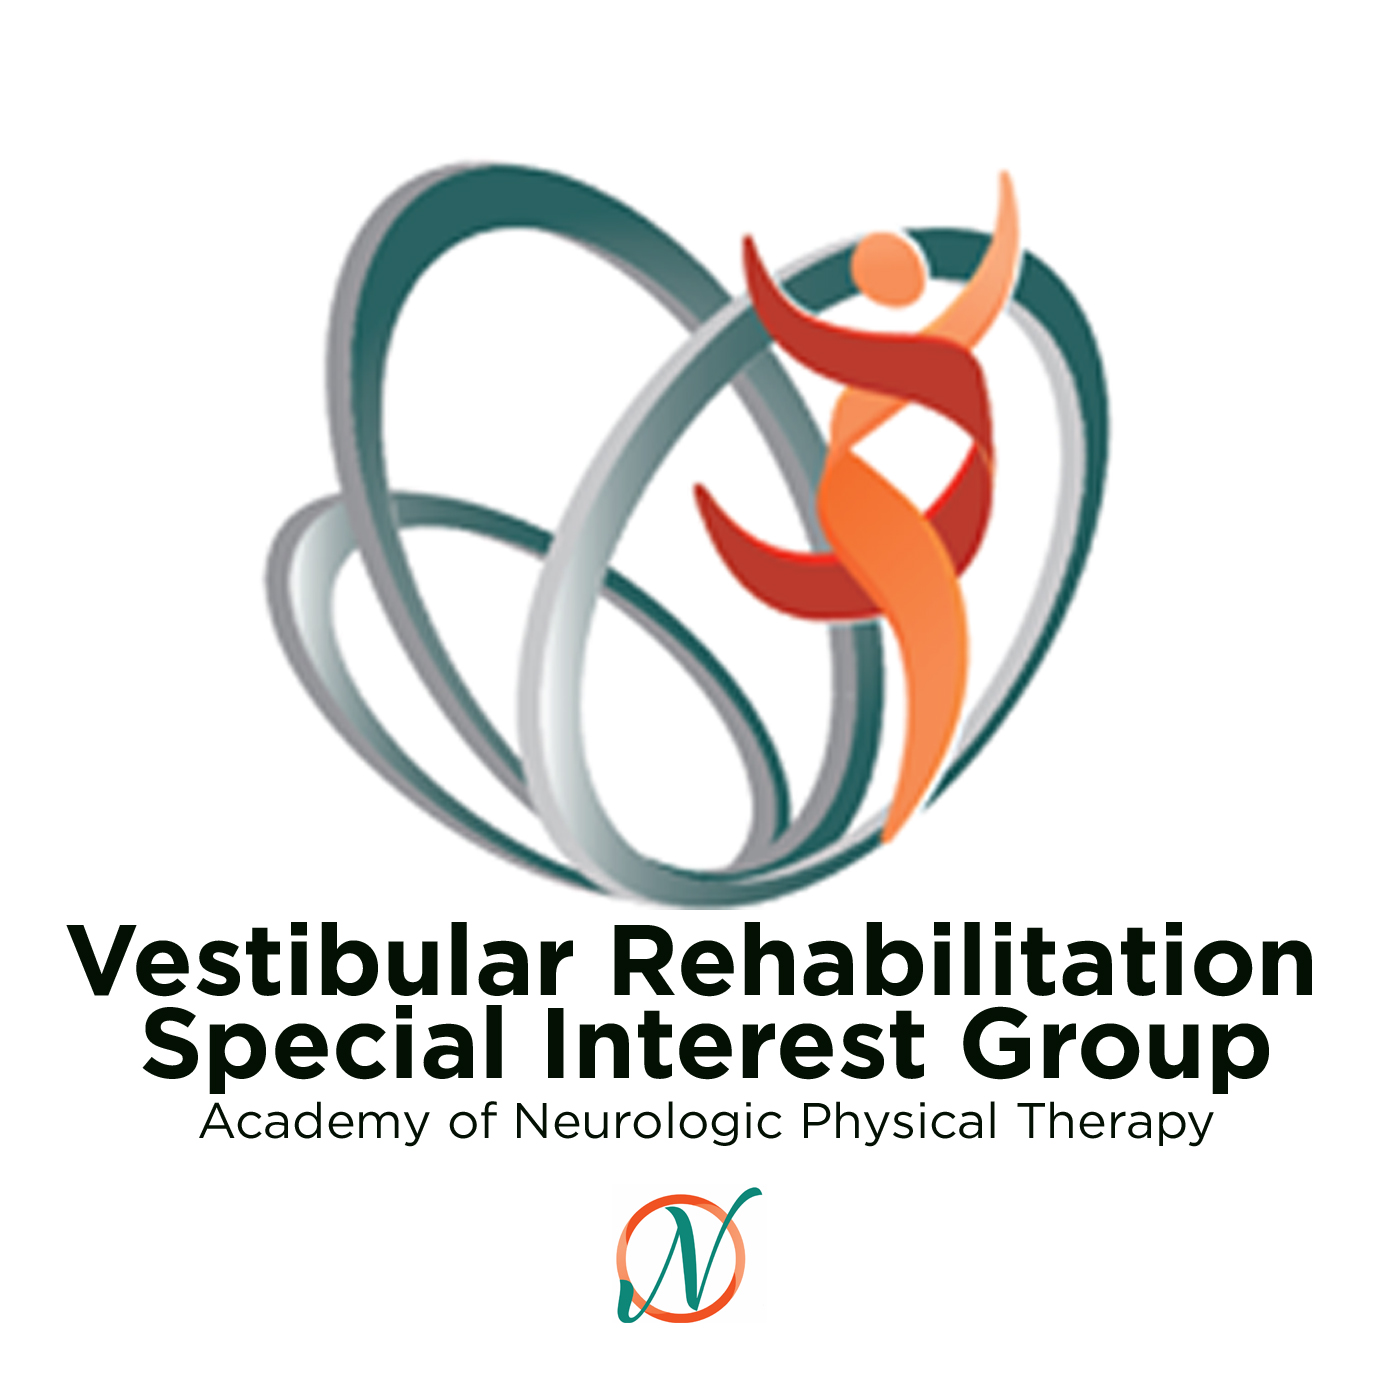 ANPT Vestibular Special Interest Group